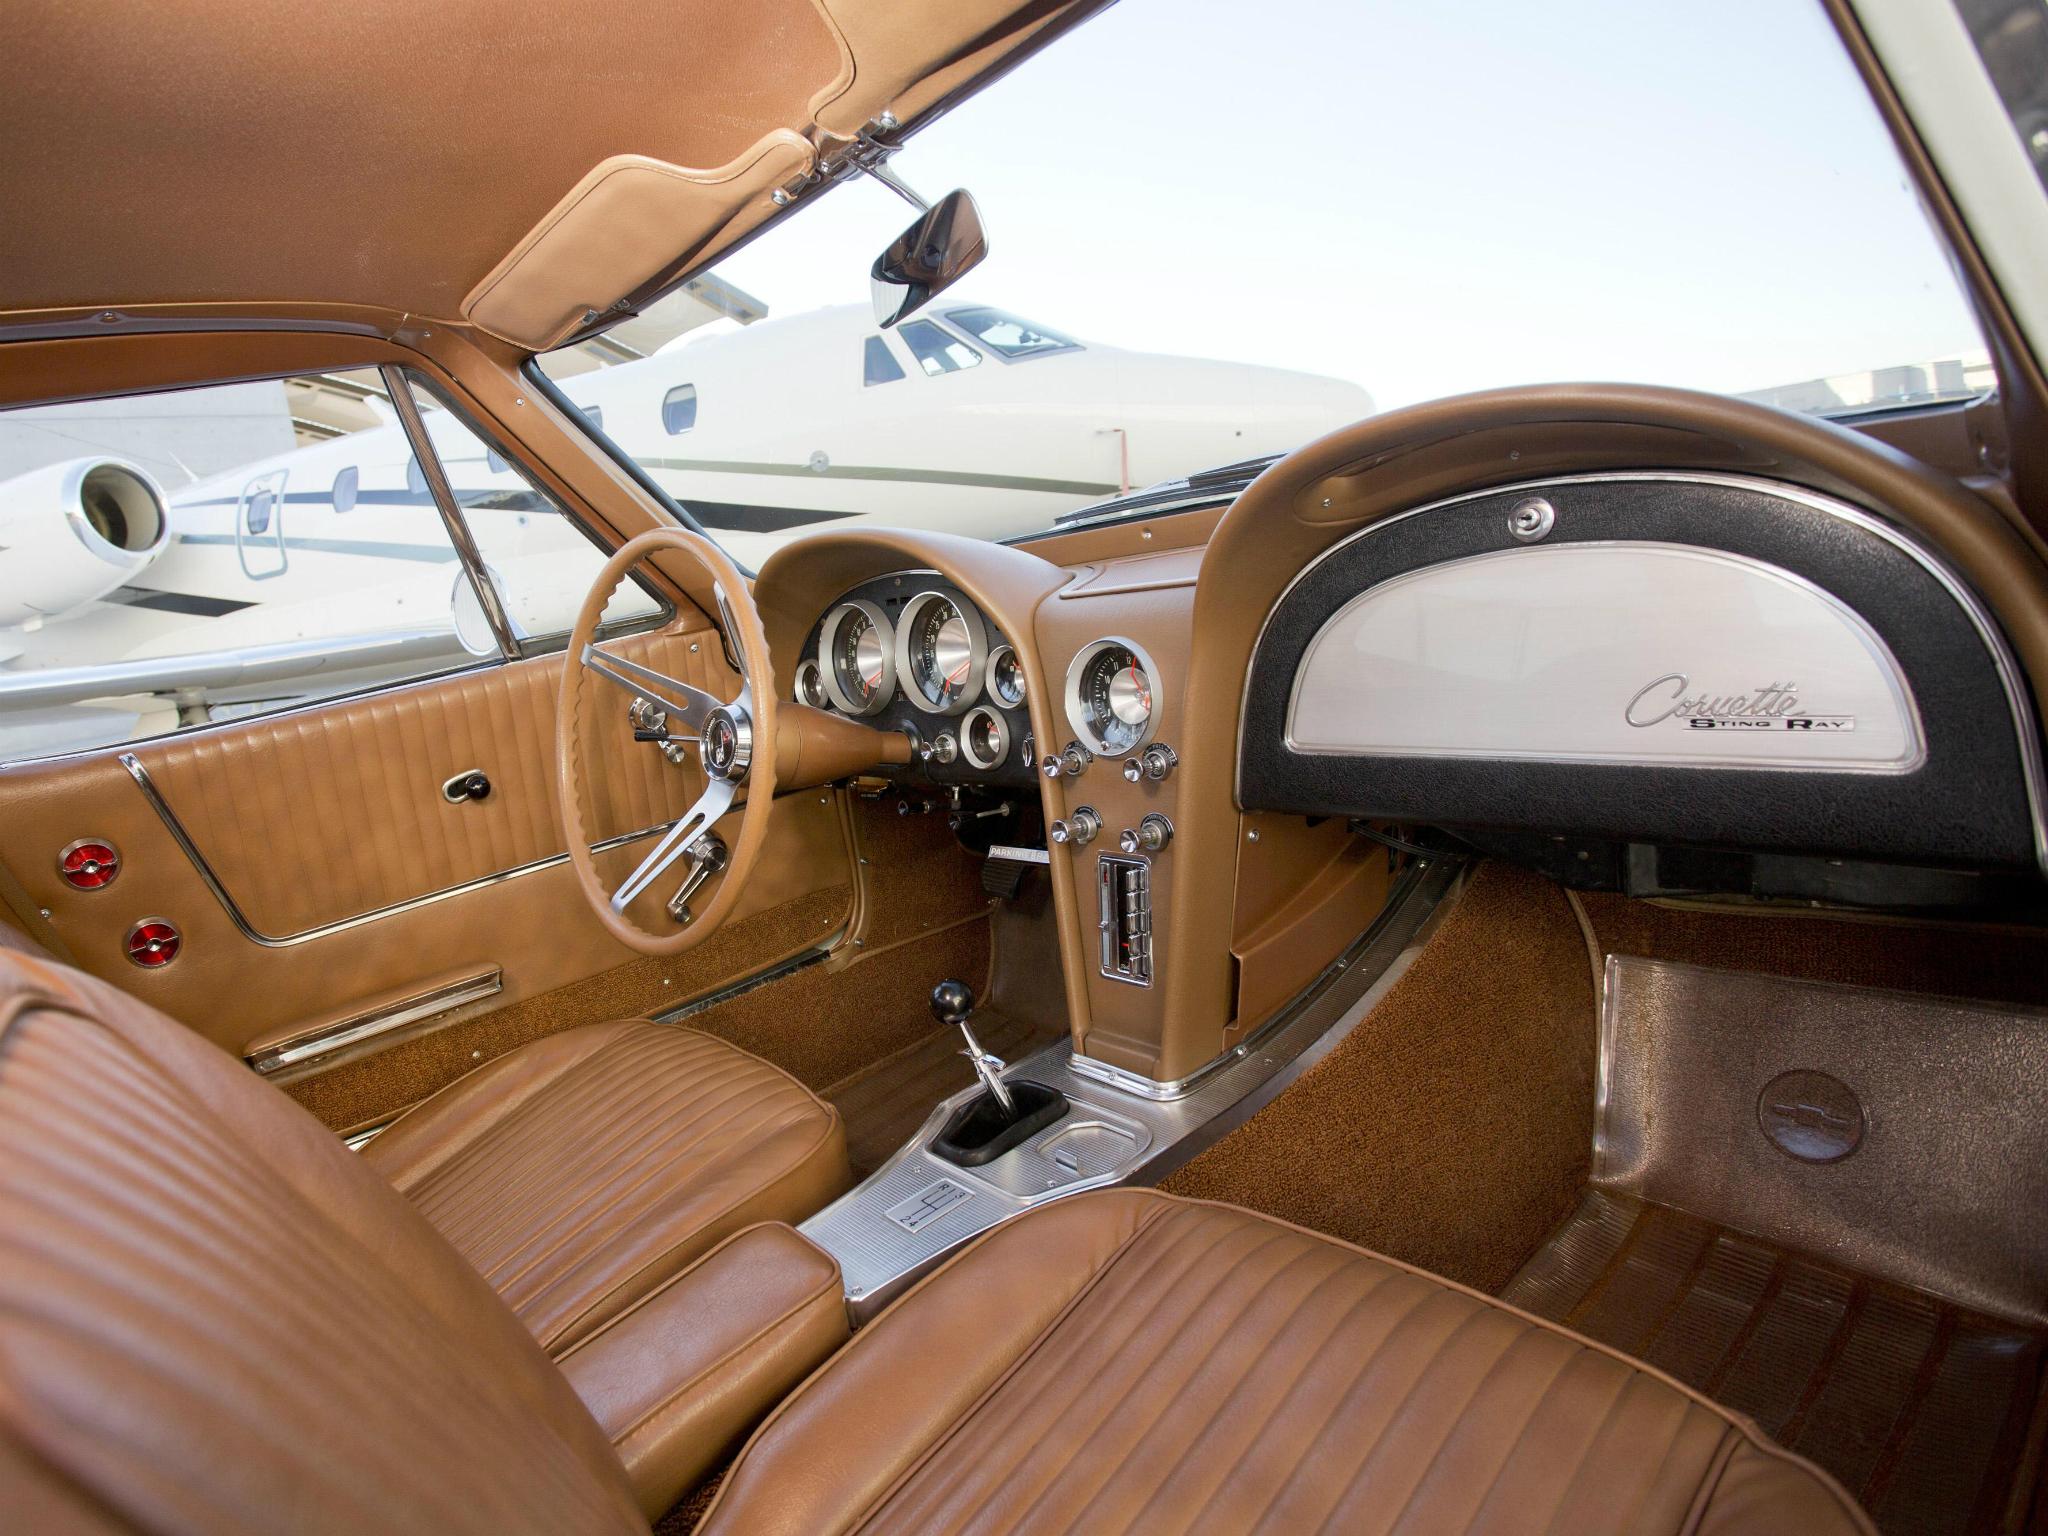 1963 Chevrolet Corvette StingRay L76 327 340HP (C-2 ...